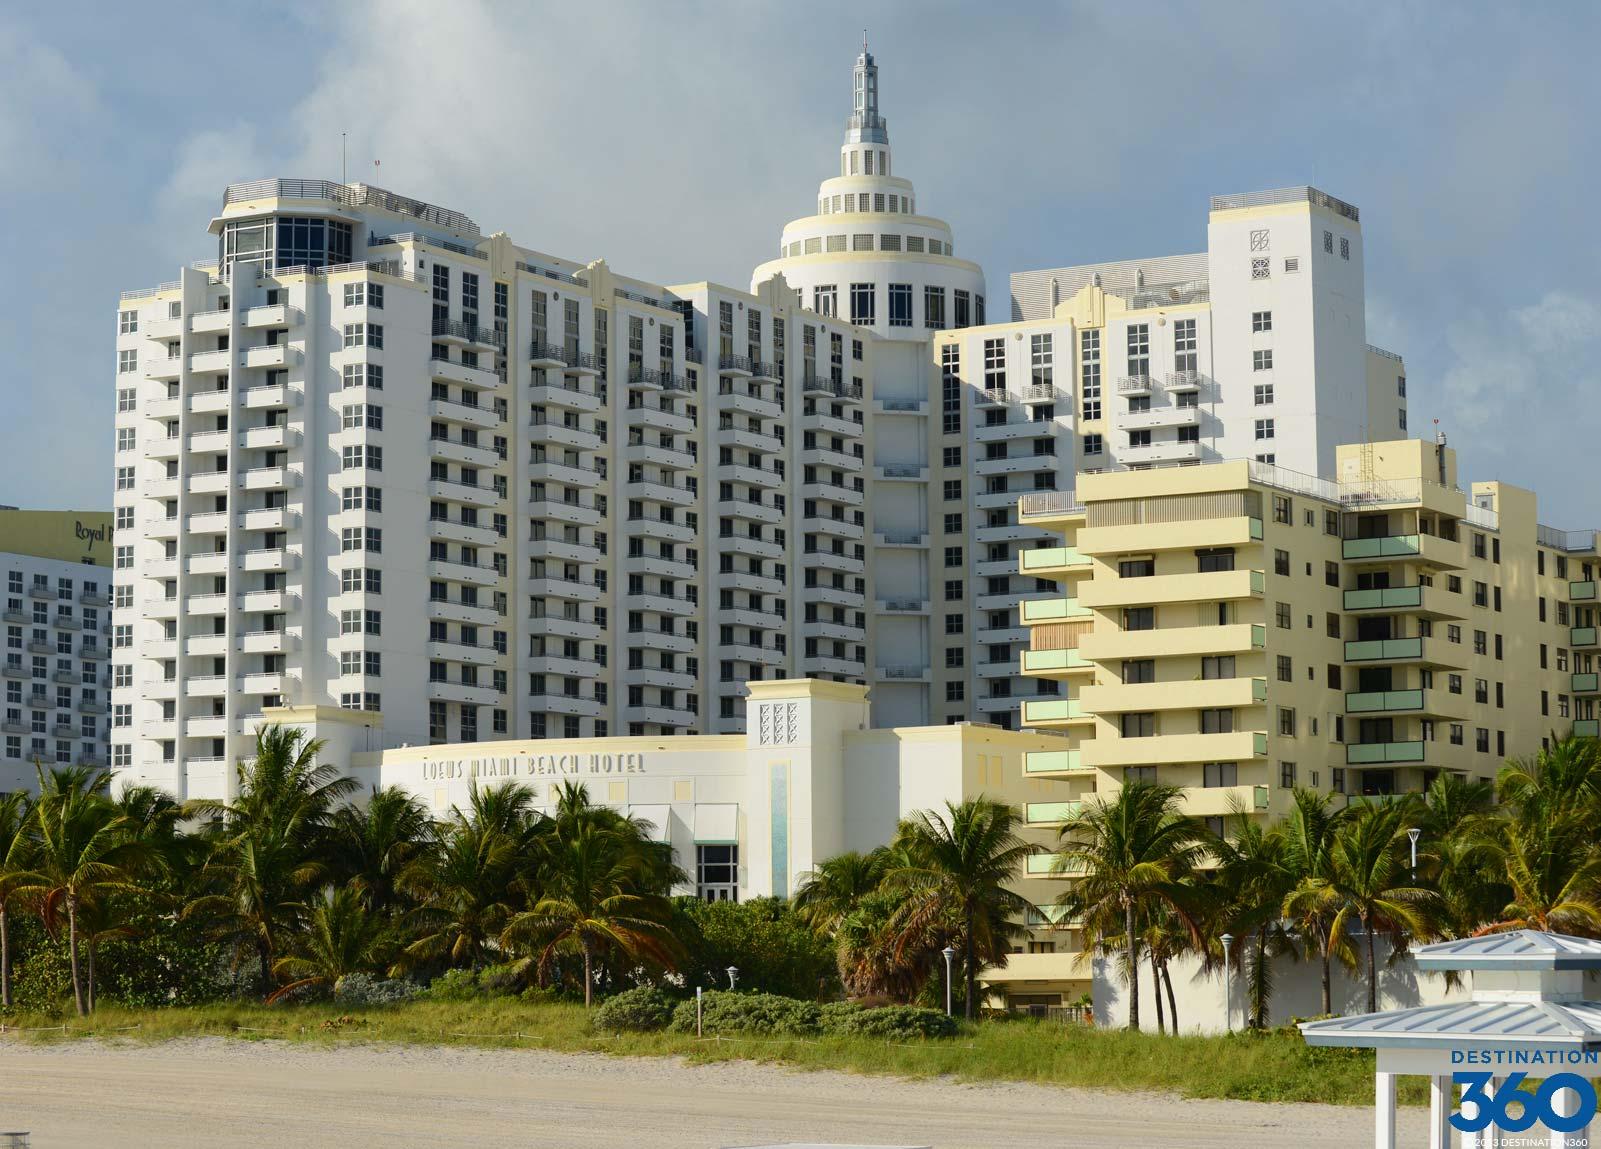 loews hotel miami - loews miami beach